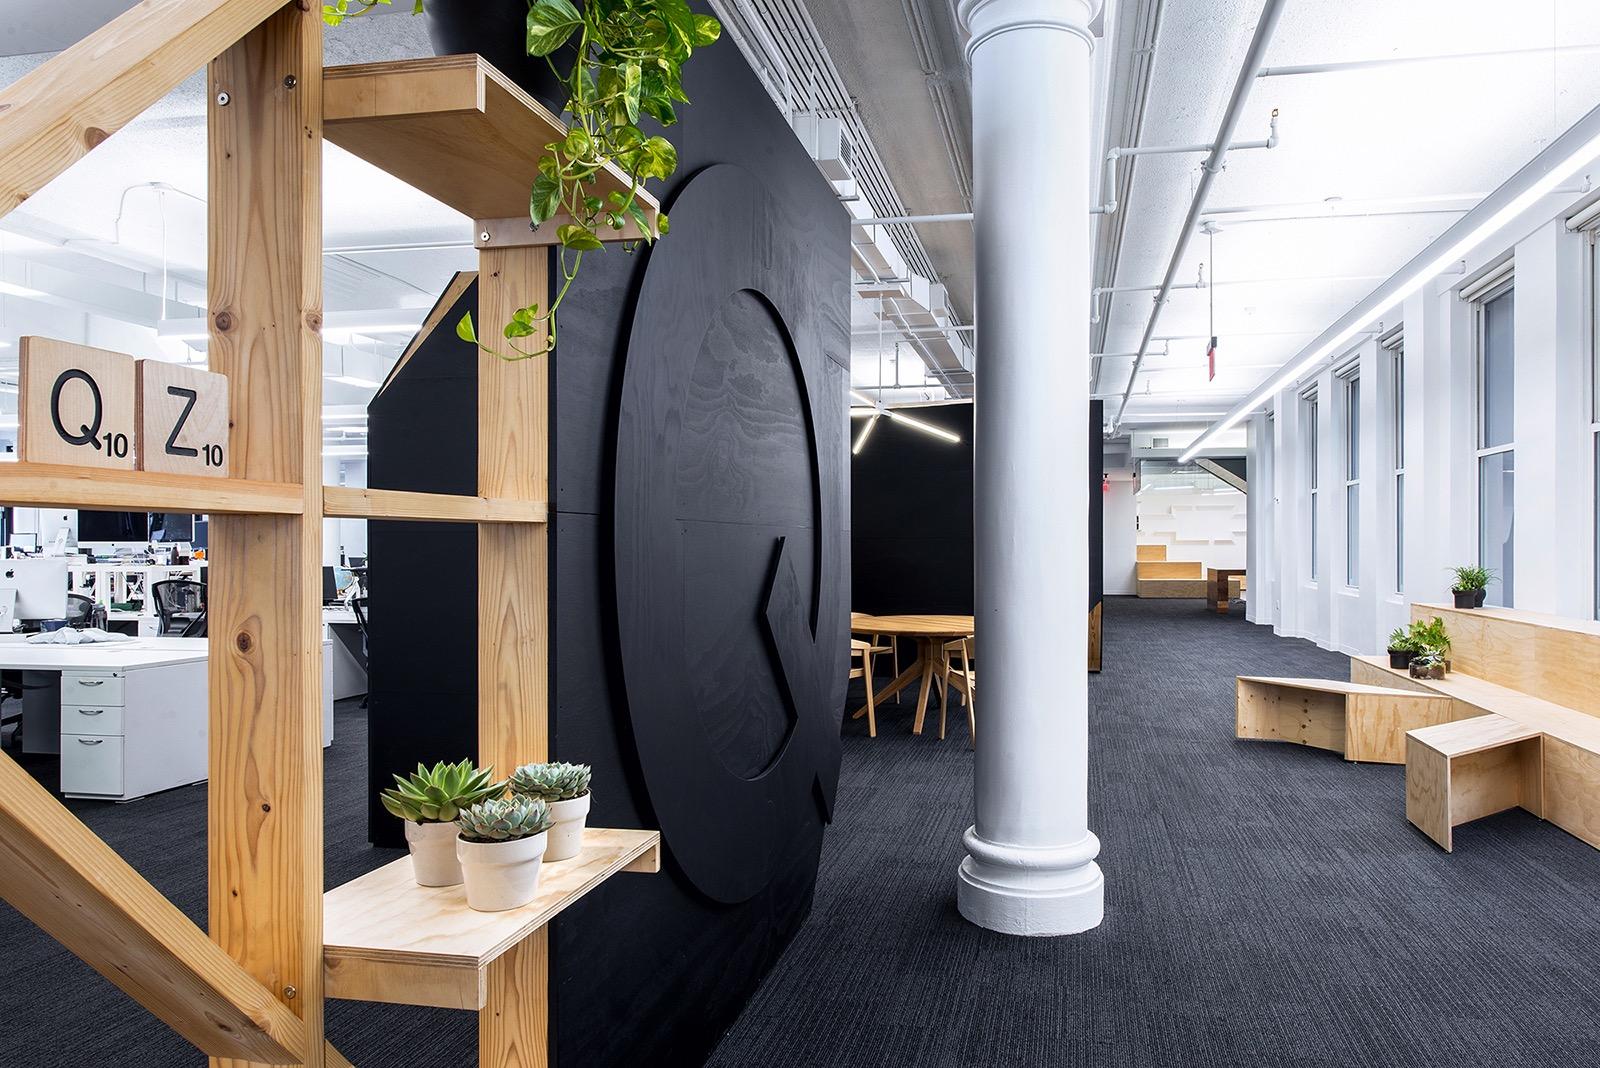 qz-office-nyc-1.jpg